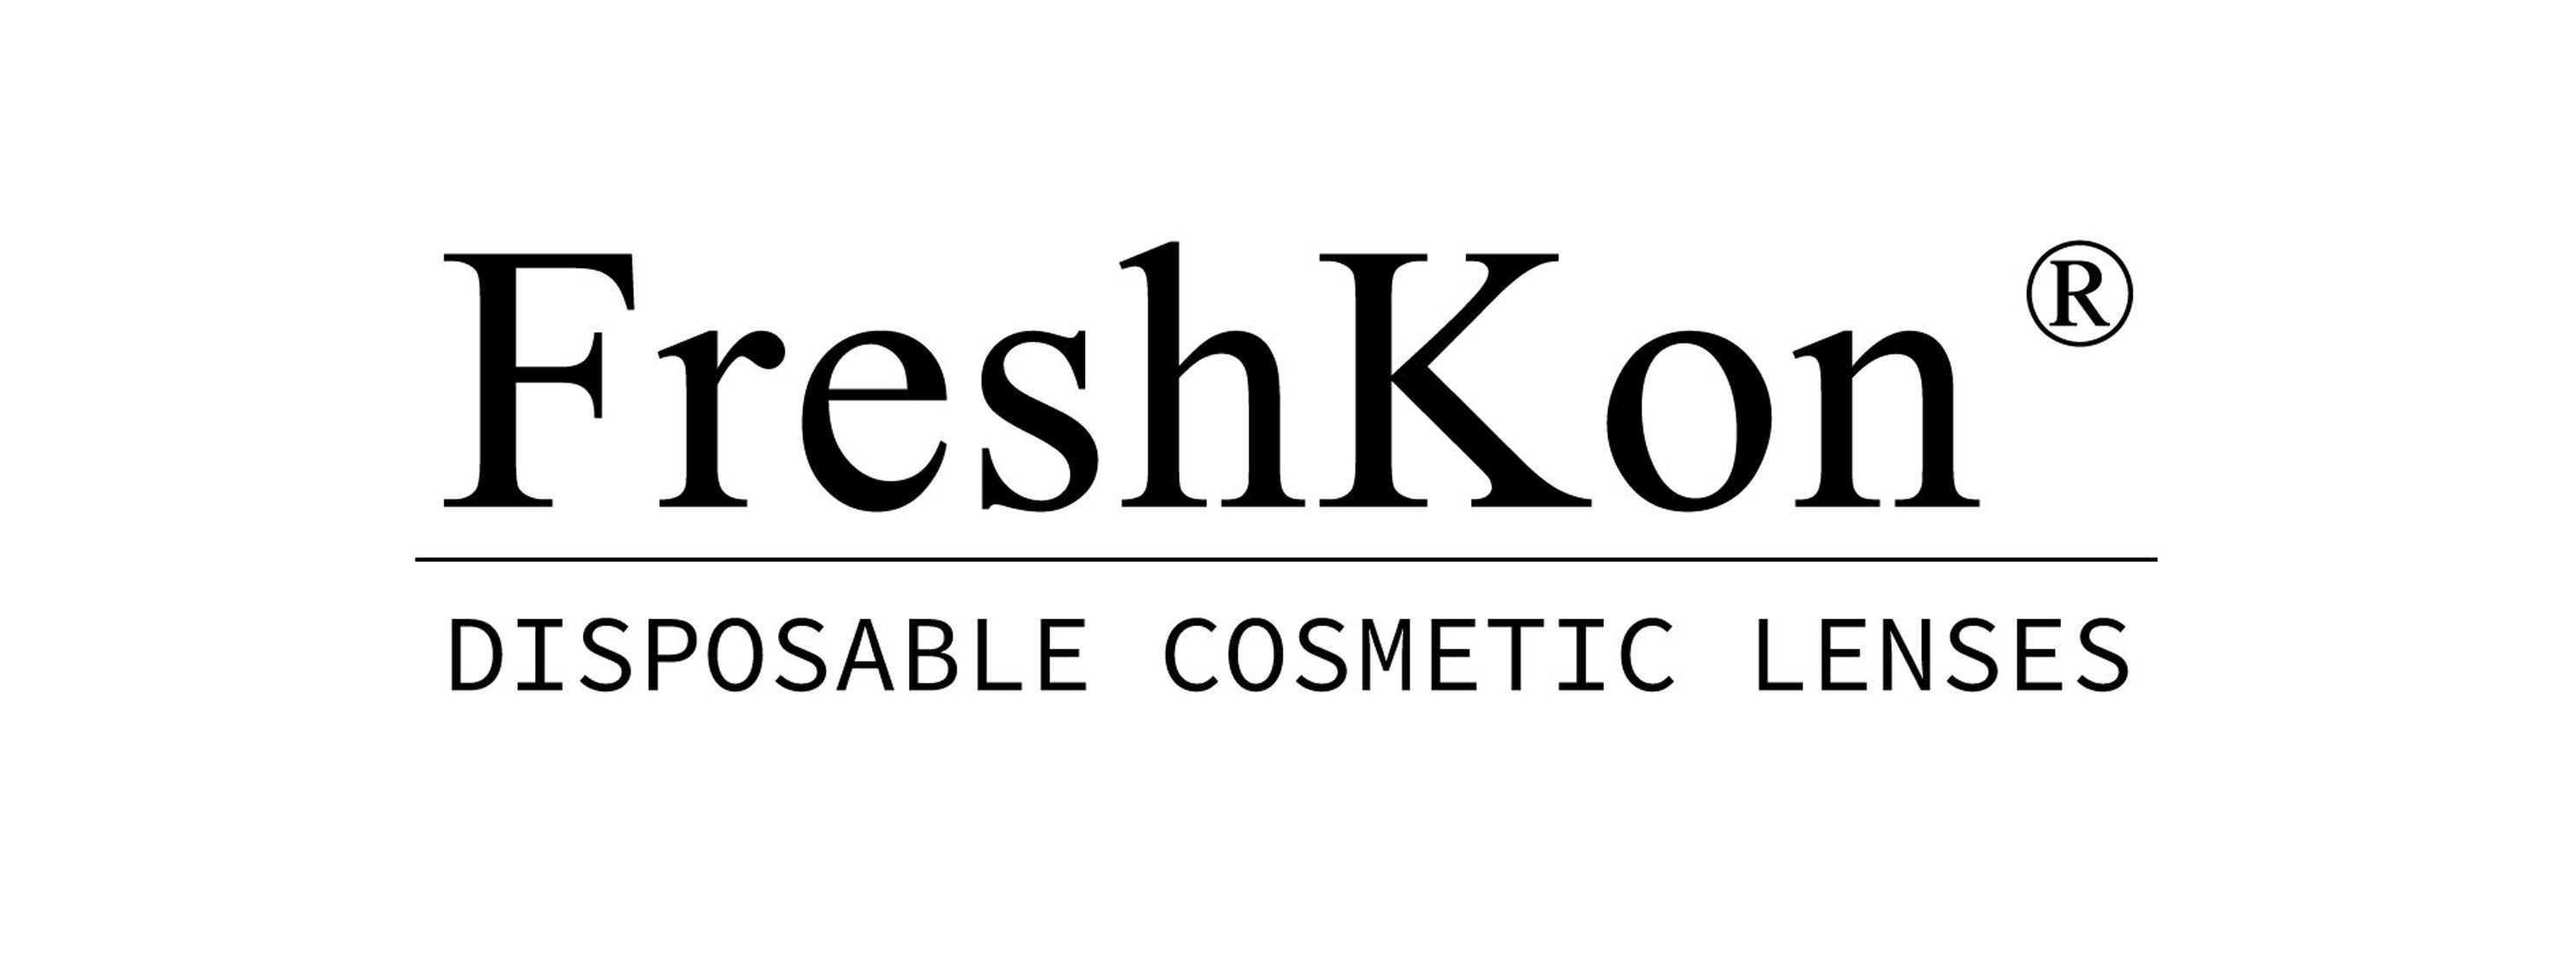 Contact Lenses: FreshKon